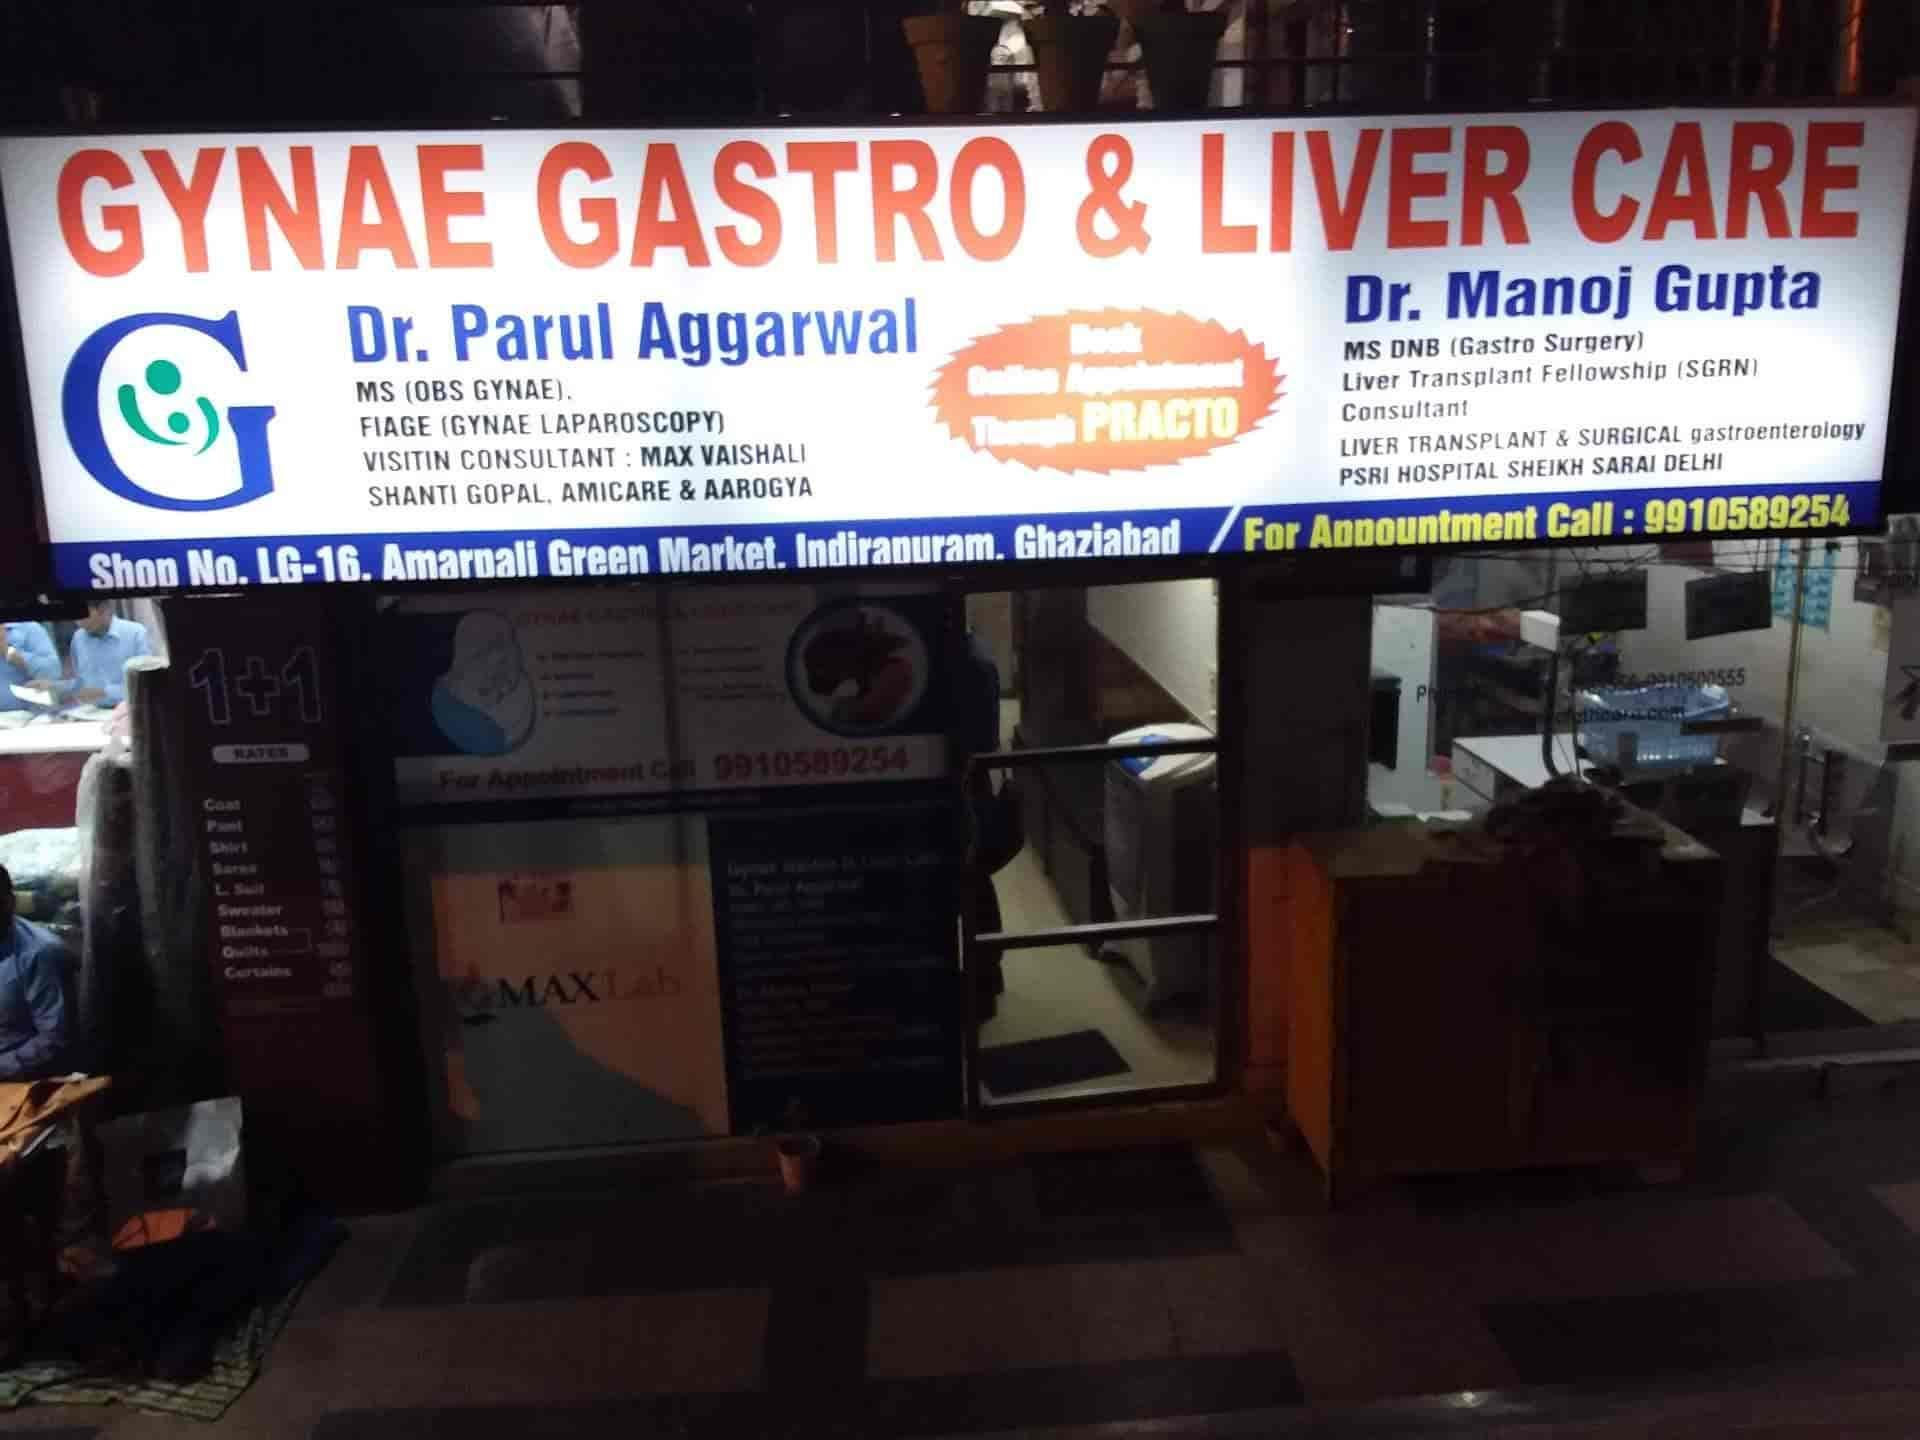 Gynae Gastro Liver Care Photos, Vaibhav Khand Indirapuram, Delhi